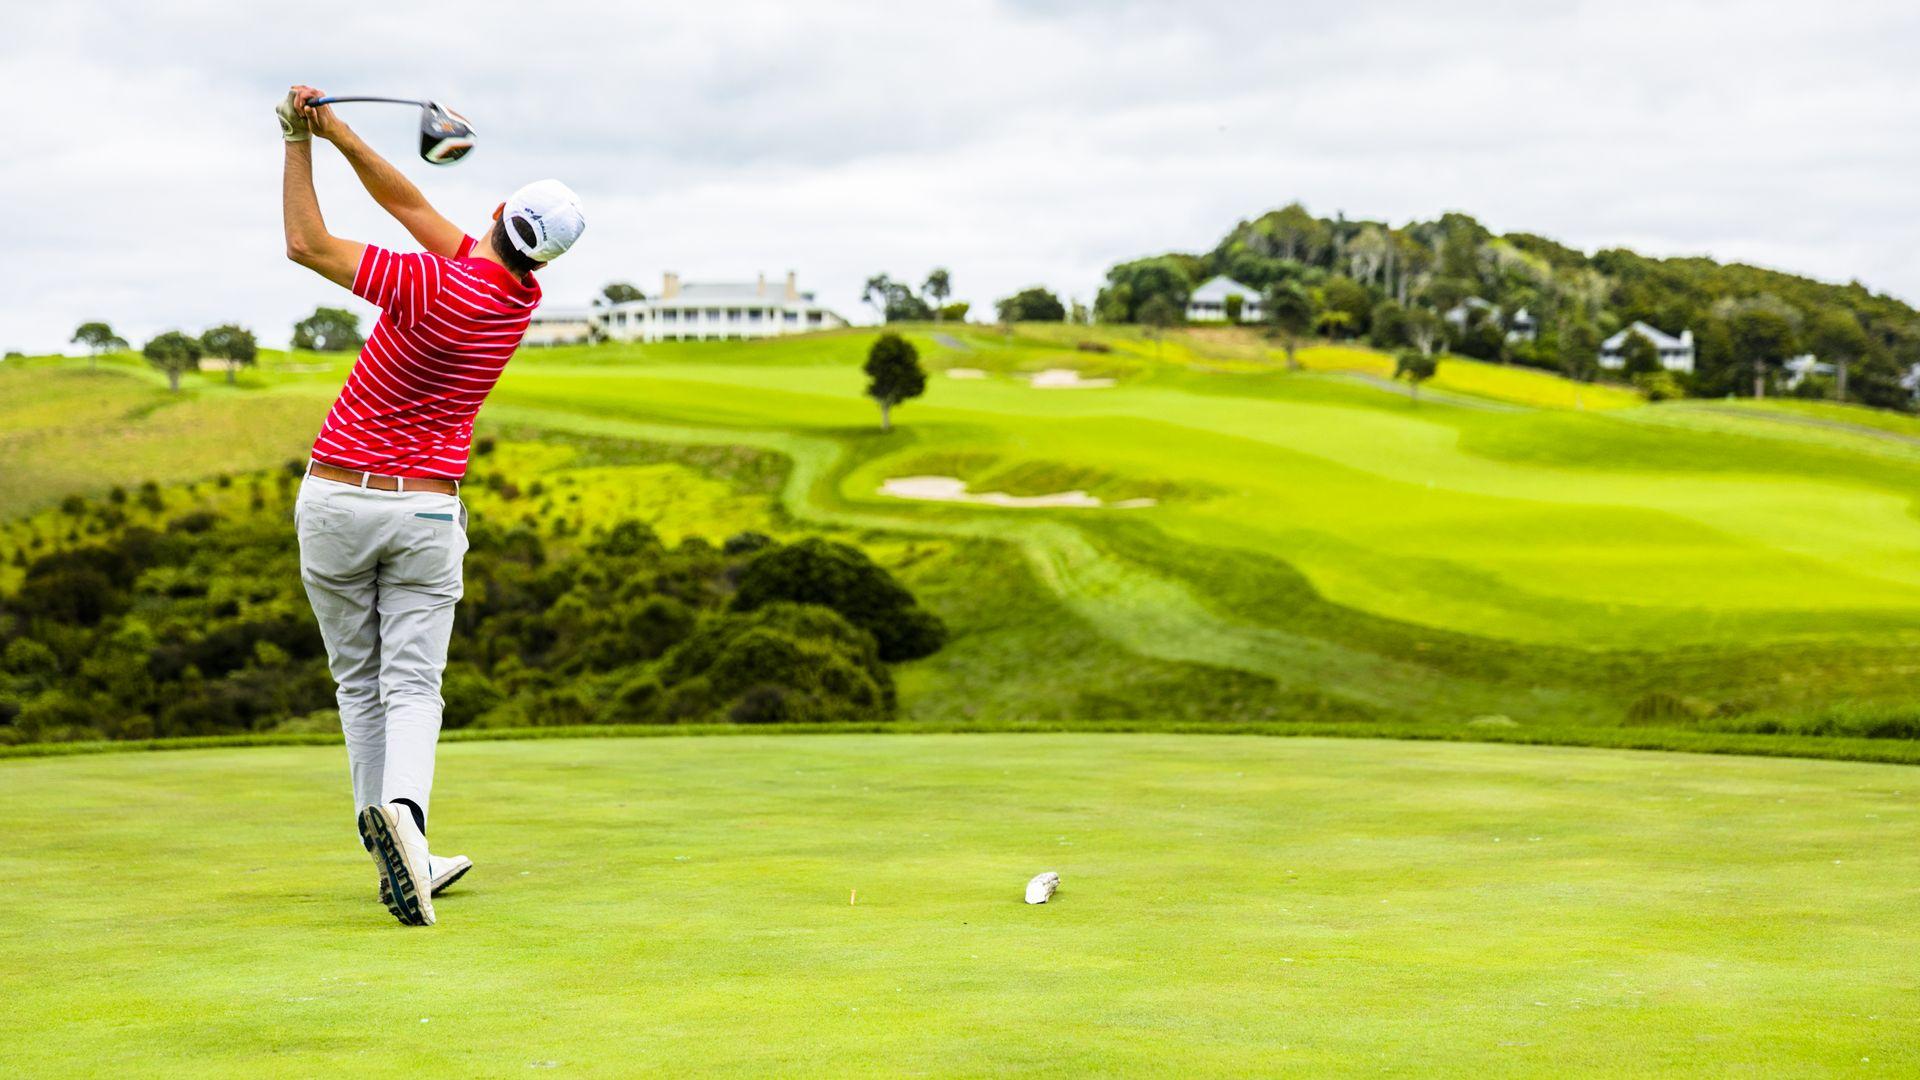 A golfer tee's off at Kauri Cliffs 18th hole, New Zealand's North Island